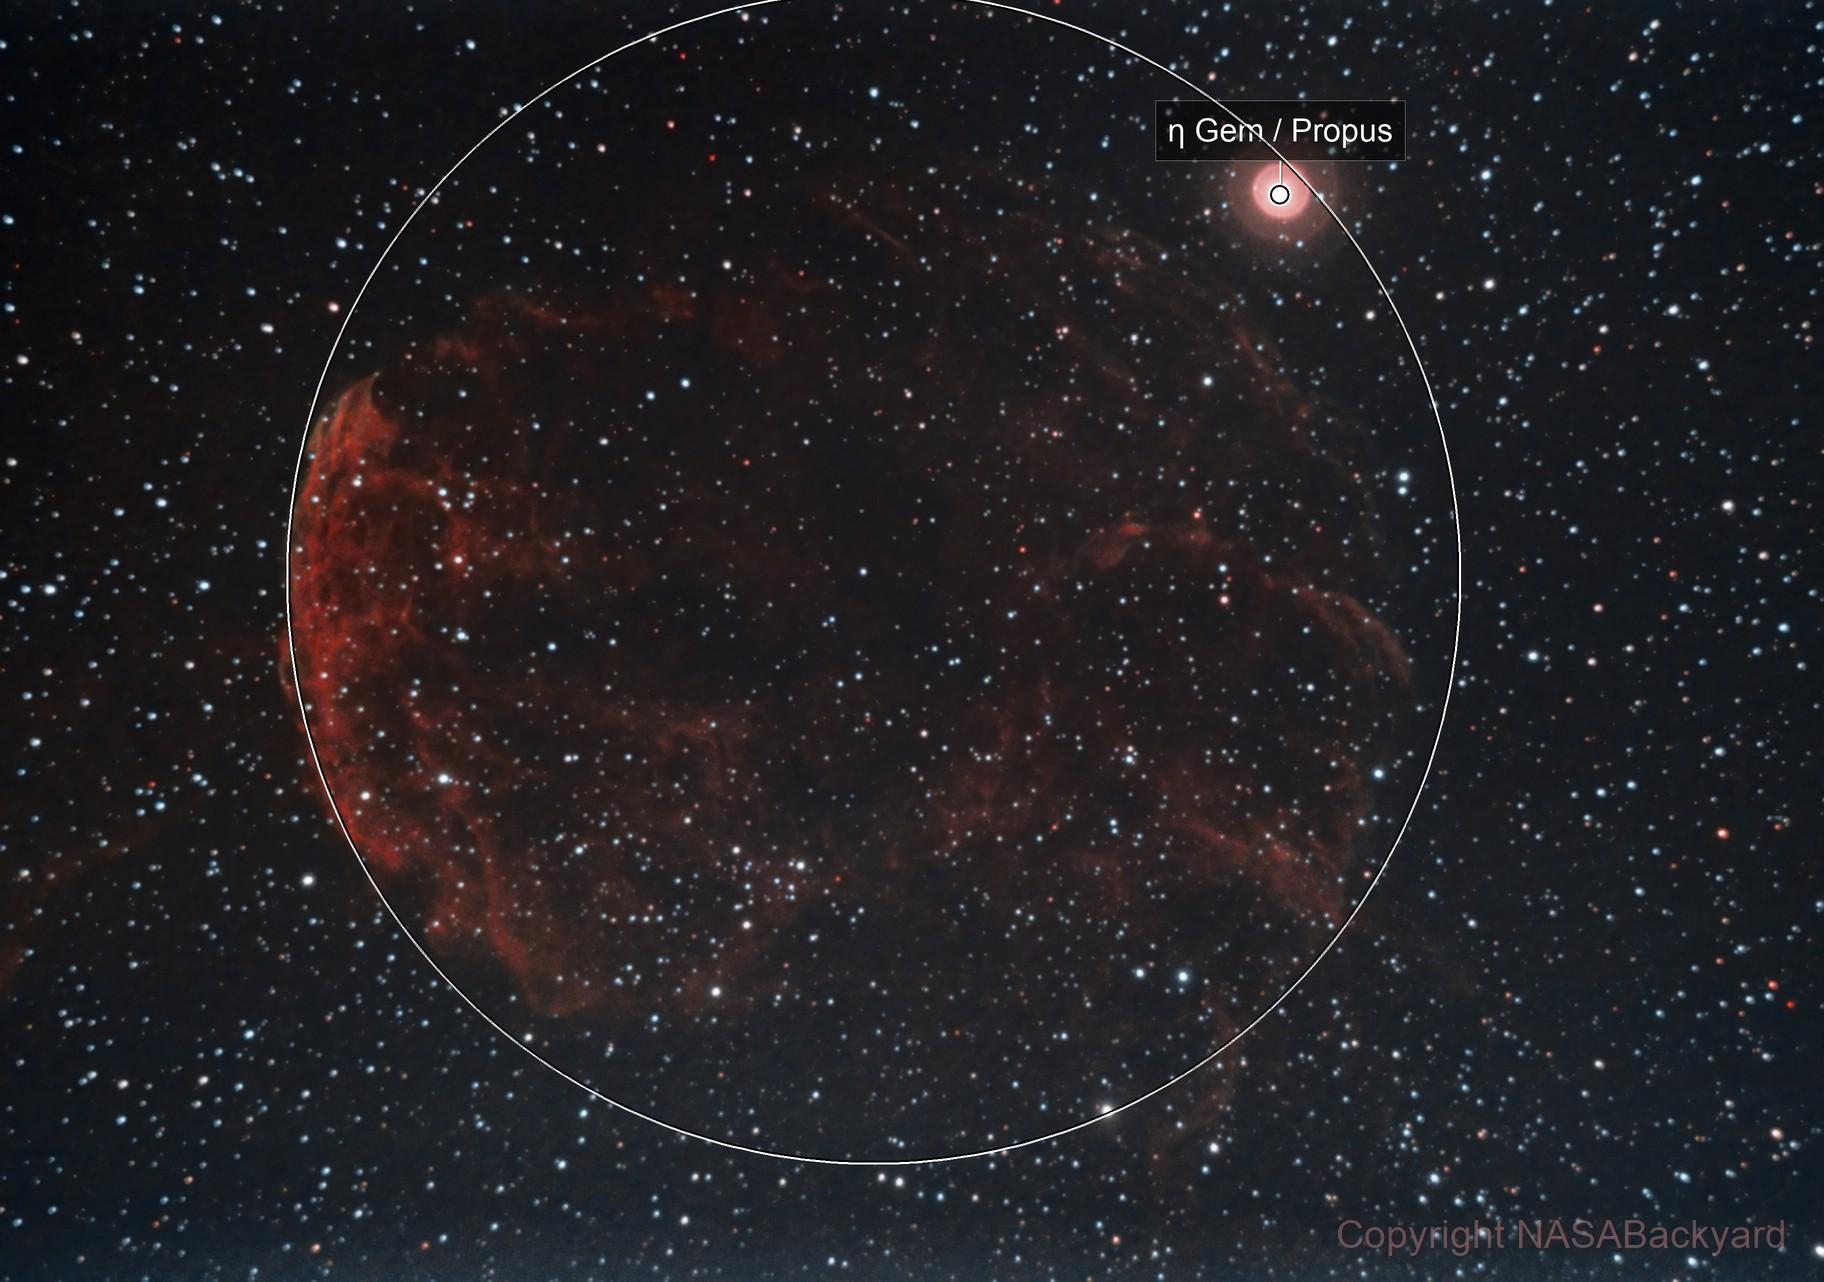 The Jellyfish Nebula (IC 443)